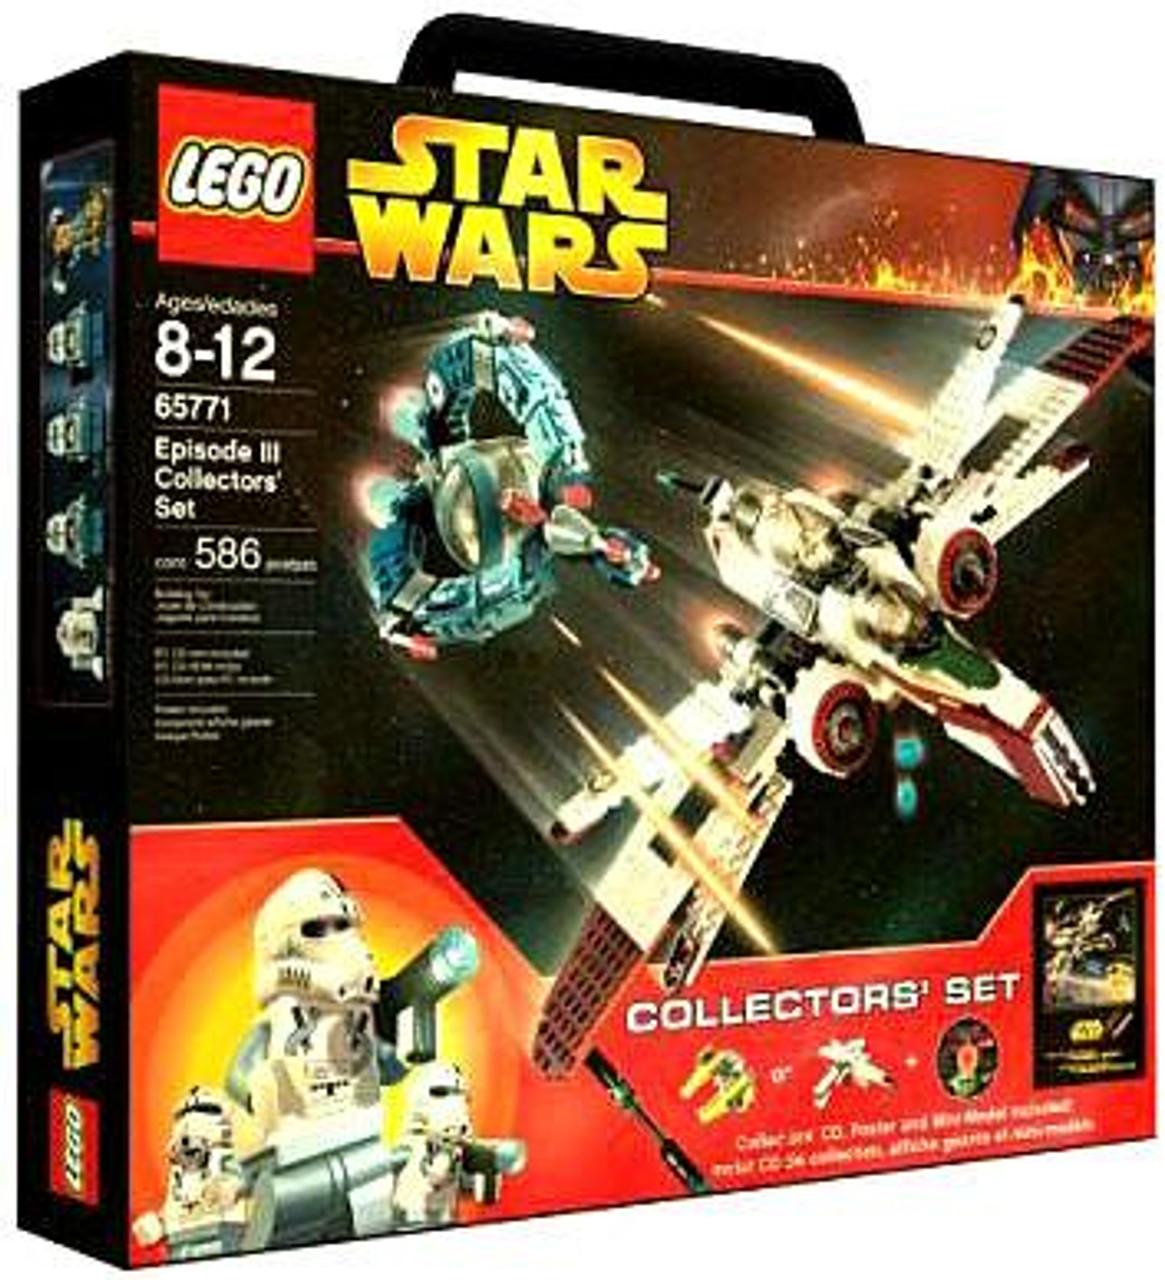 LEGO Star Wars Revenge of the Sith Episode III Collectors' Set #65771